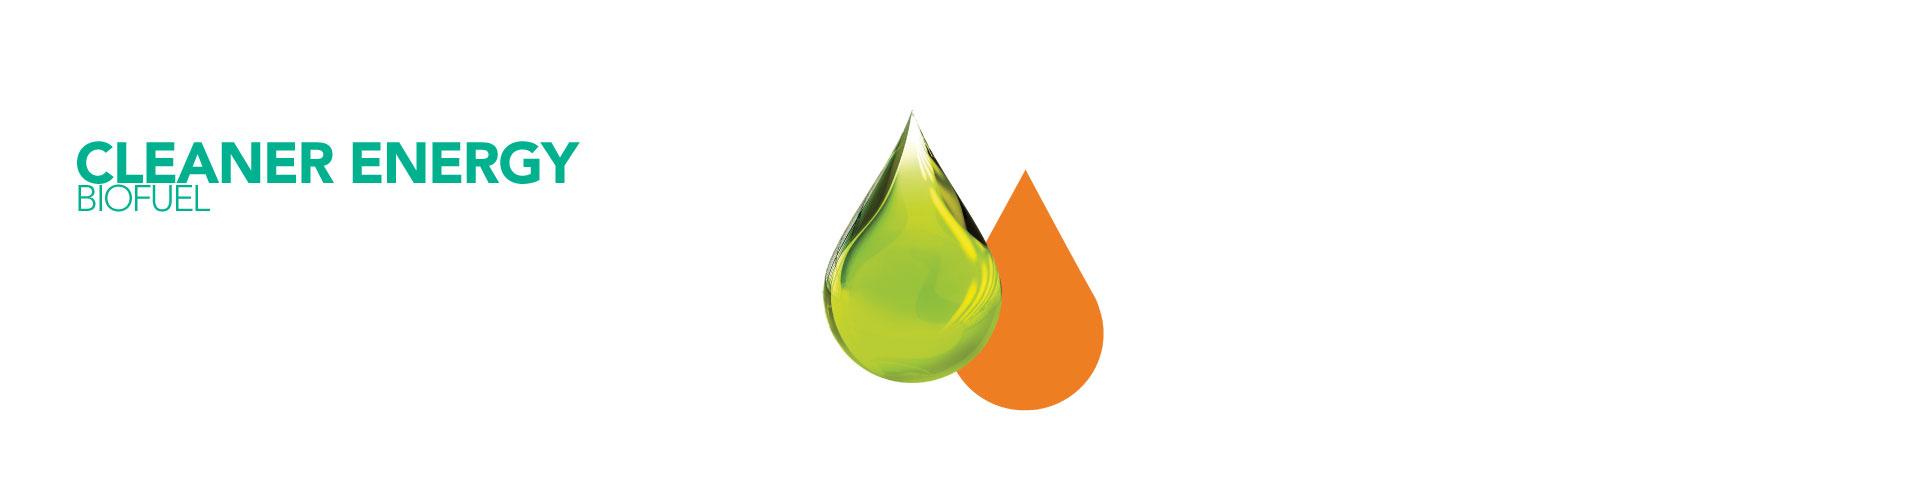 CLEANER ENERGY biofuel